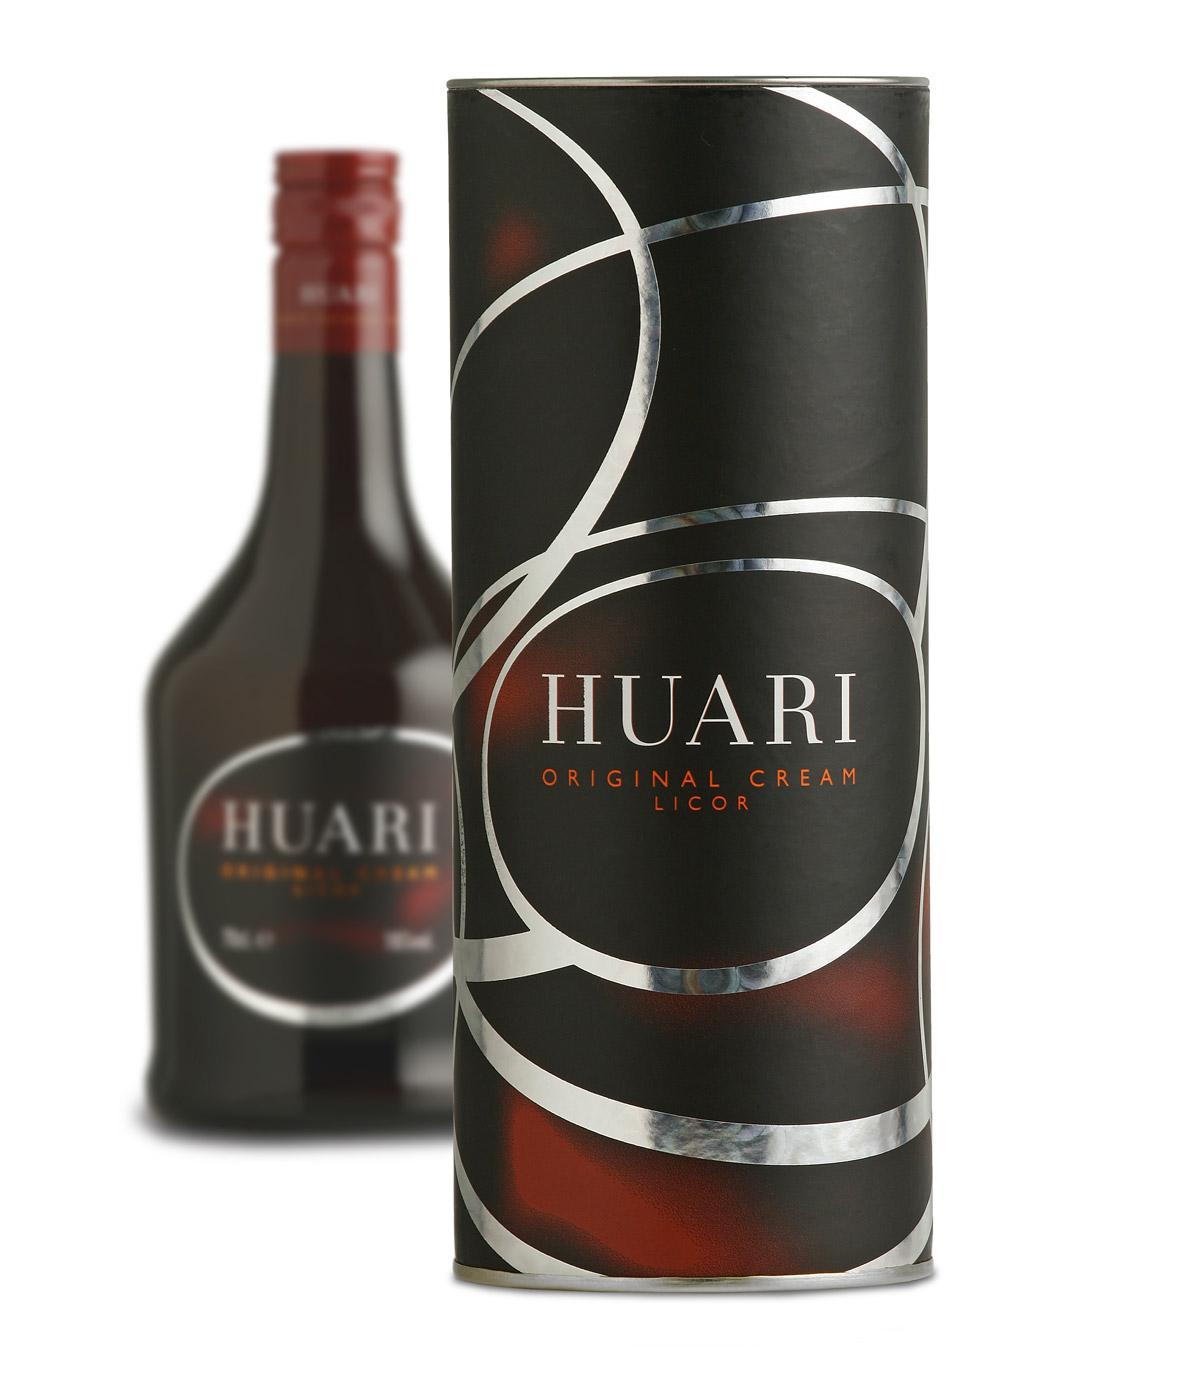 Diseño de Packaging y canister Crema HUARI